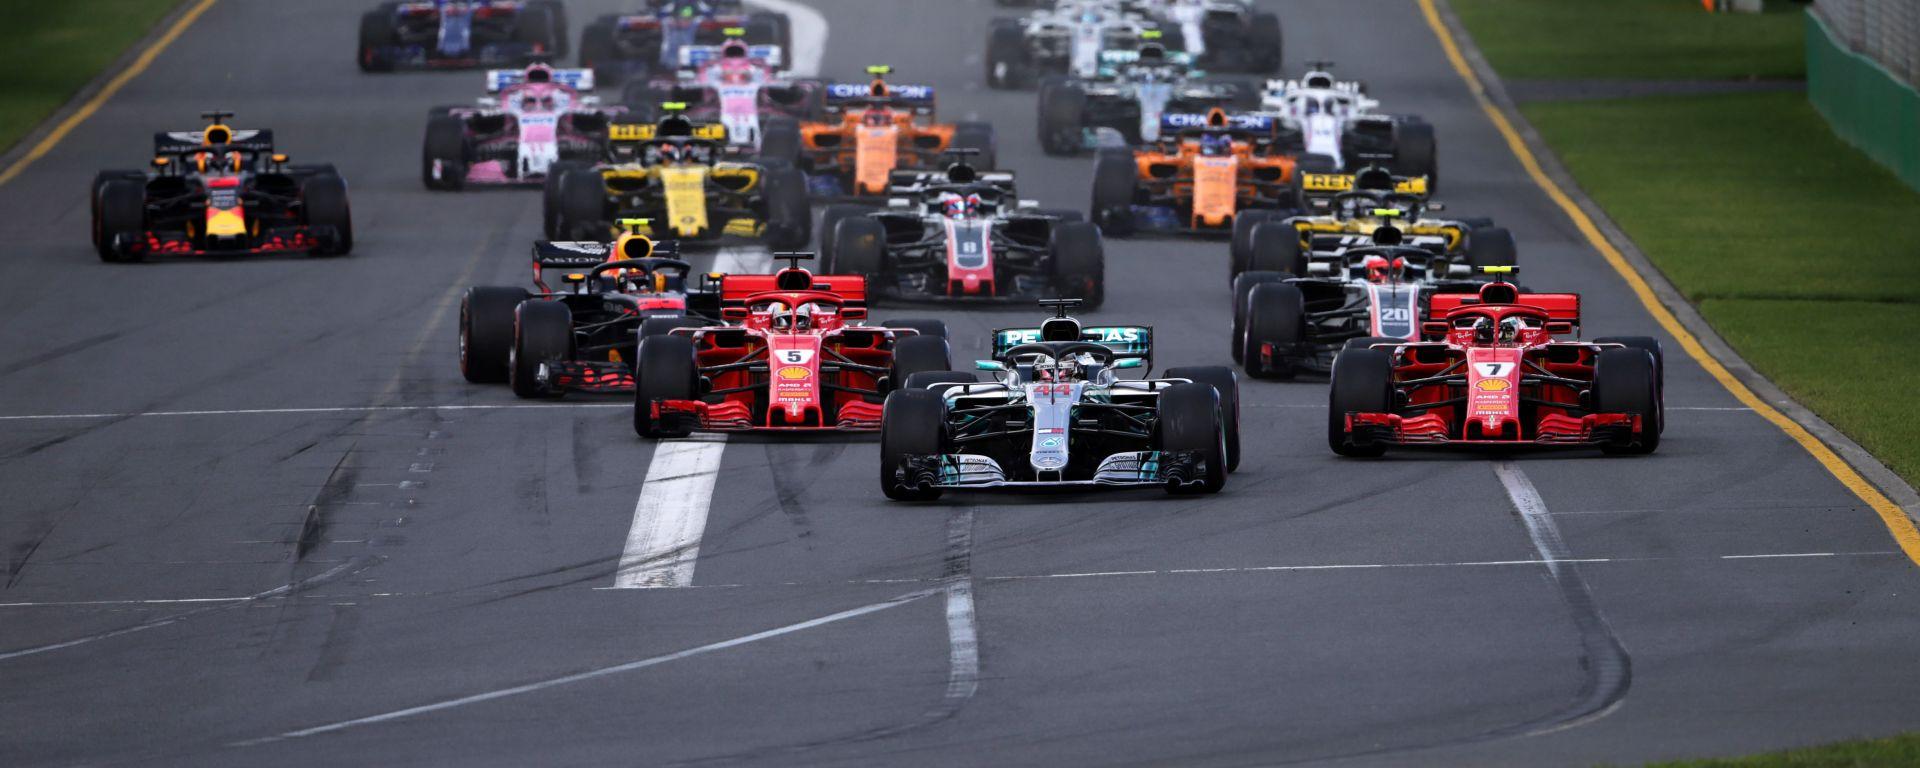 Calendario Formula 1 2019: date, orari tv e circuiti